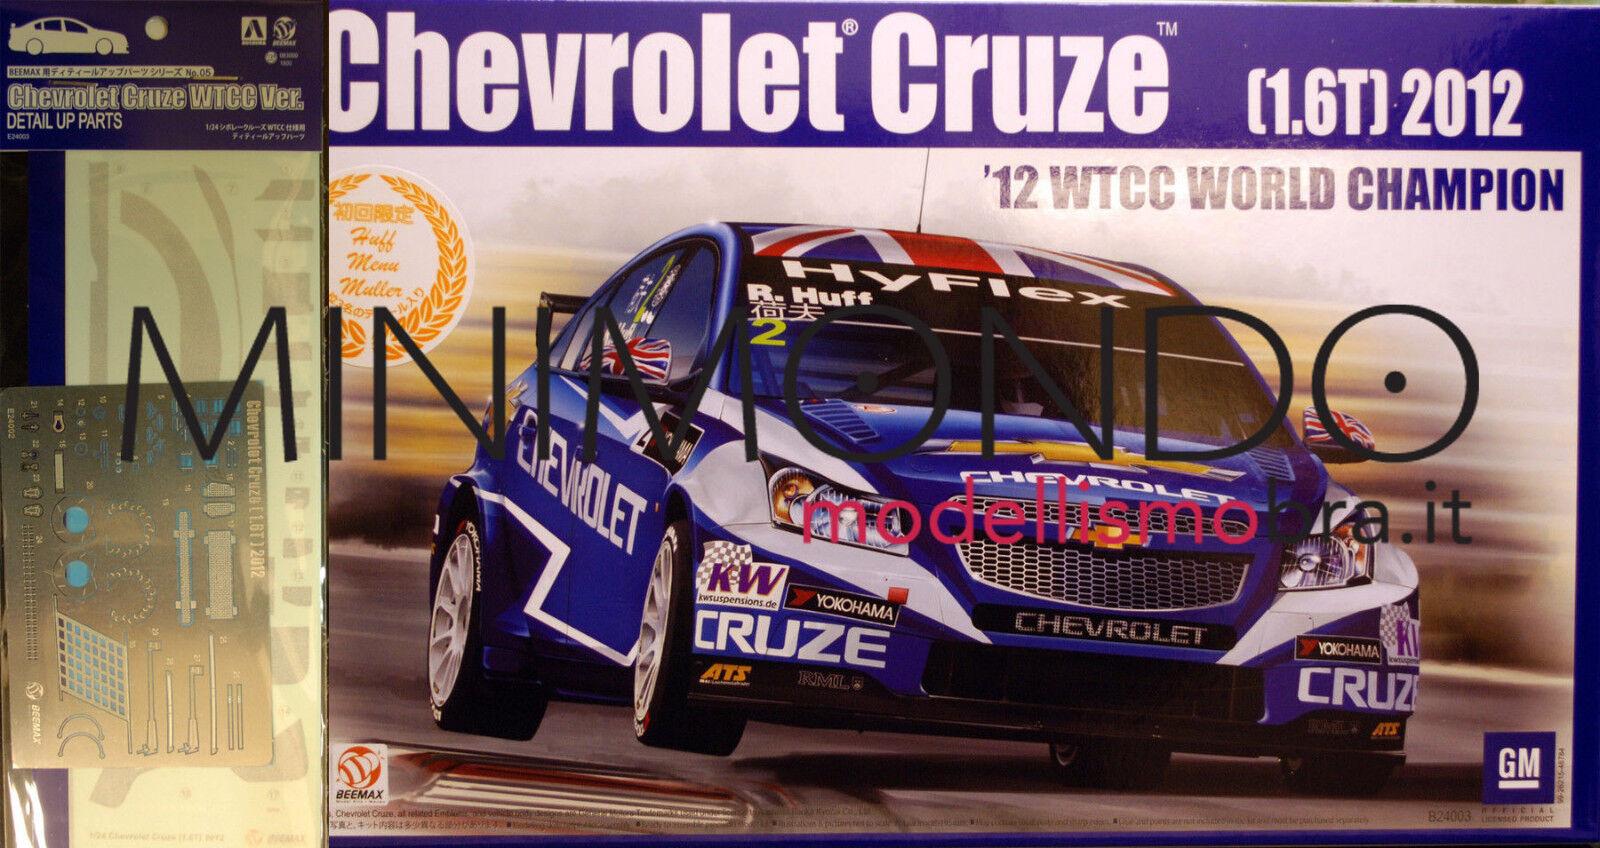 KIT CHEVROLET CRUZE 1.6T 2012 WTCC CHAMPION + GRADE UP 1 24 AOSHIMA 08299 BEEMAX